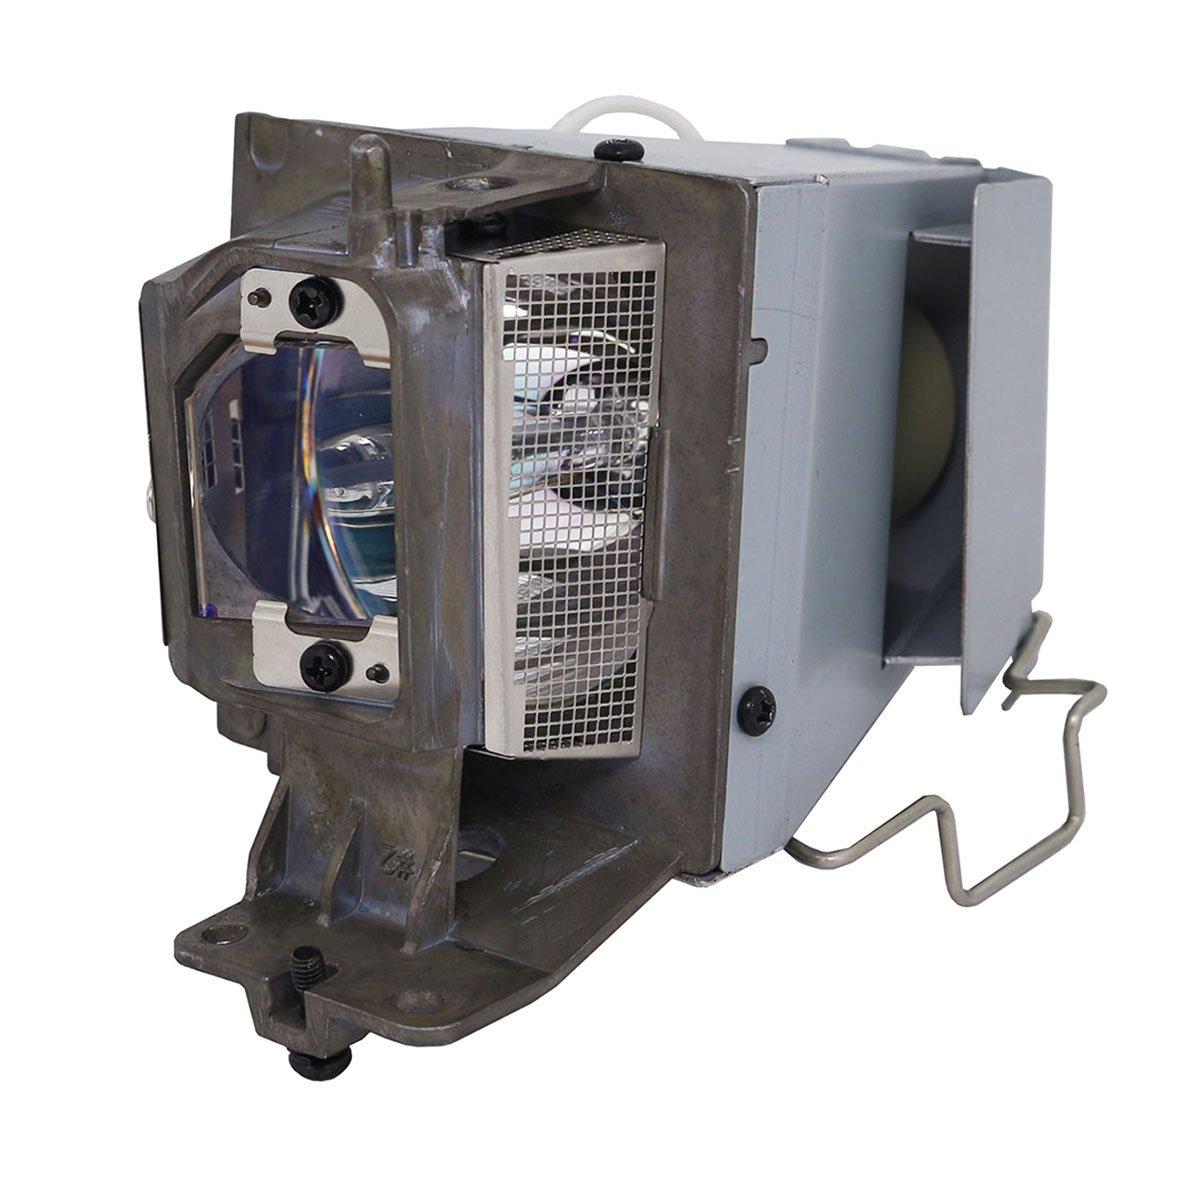 Ceybo S341 ランプ/電球交換 ハウジング付き Optoma プロジェクター用   B07PHJJC9C